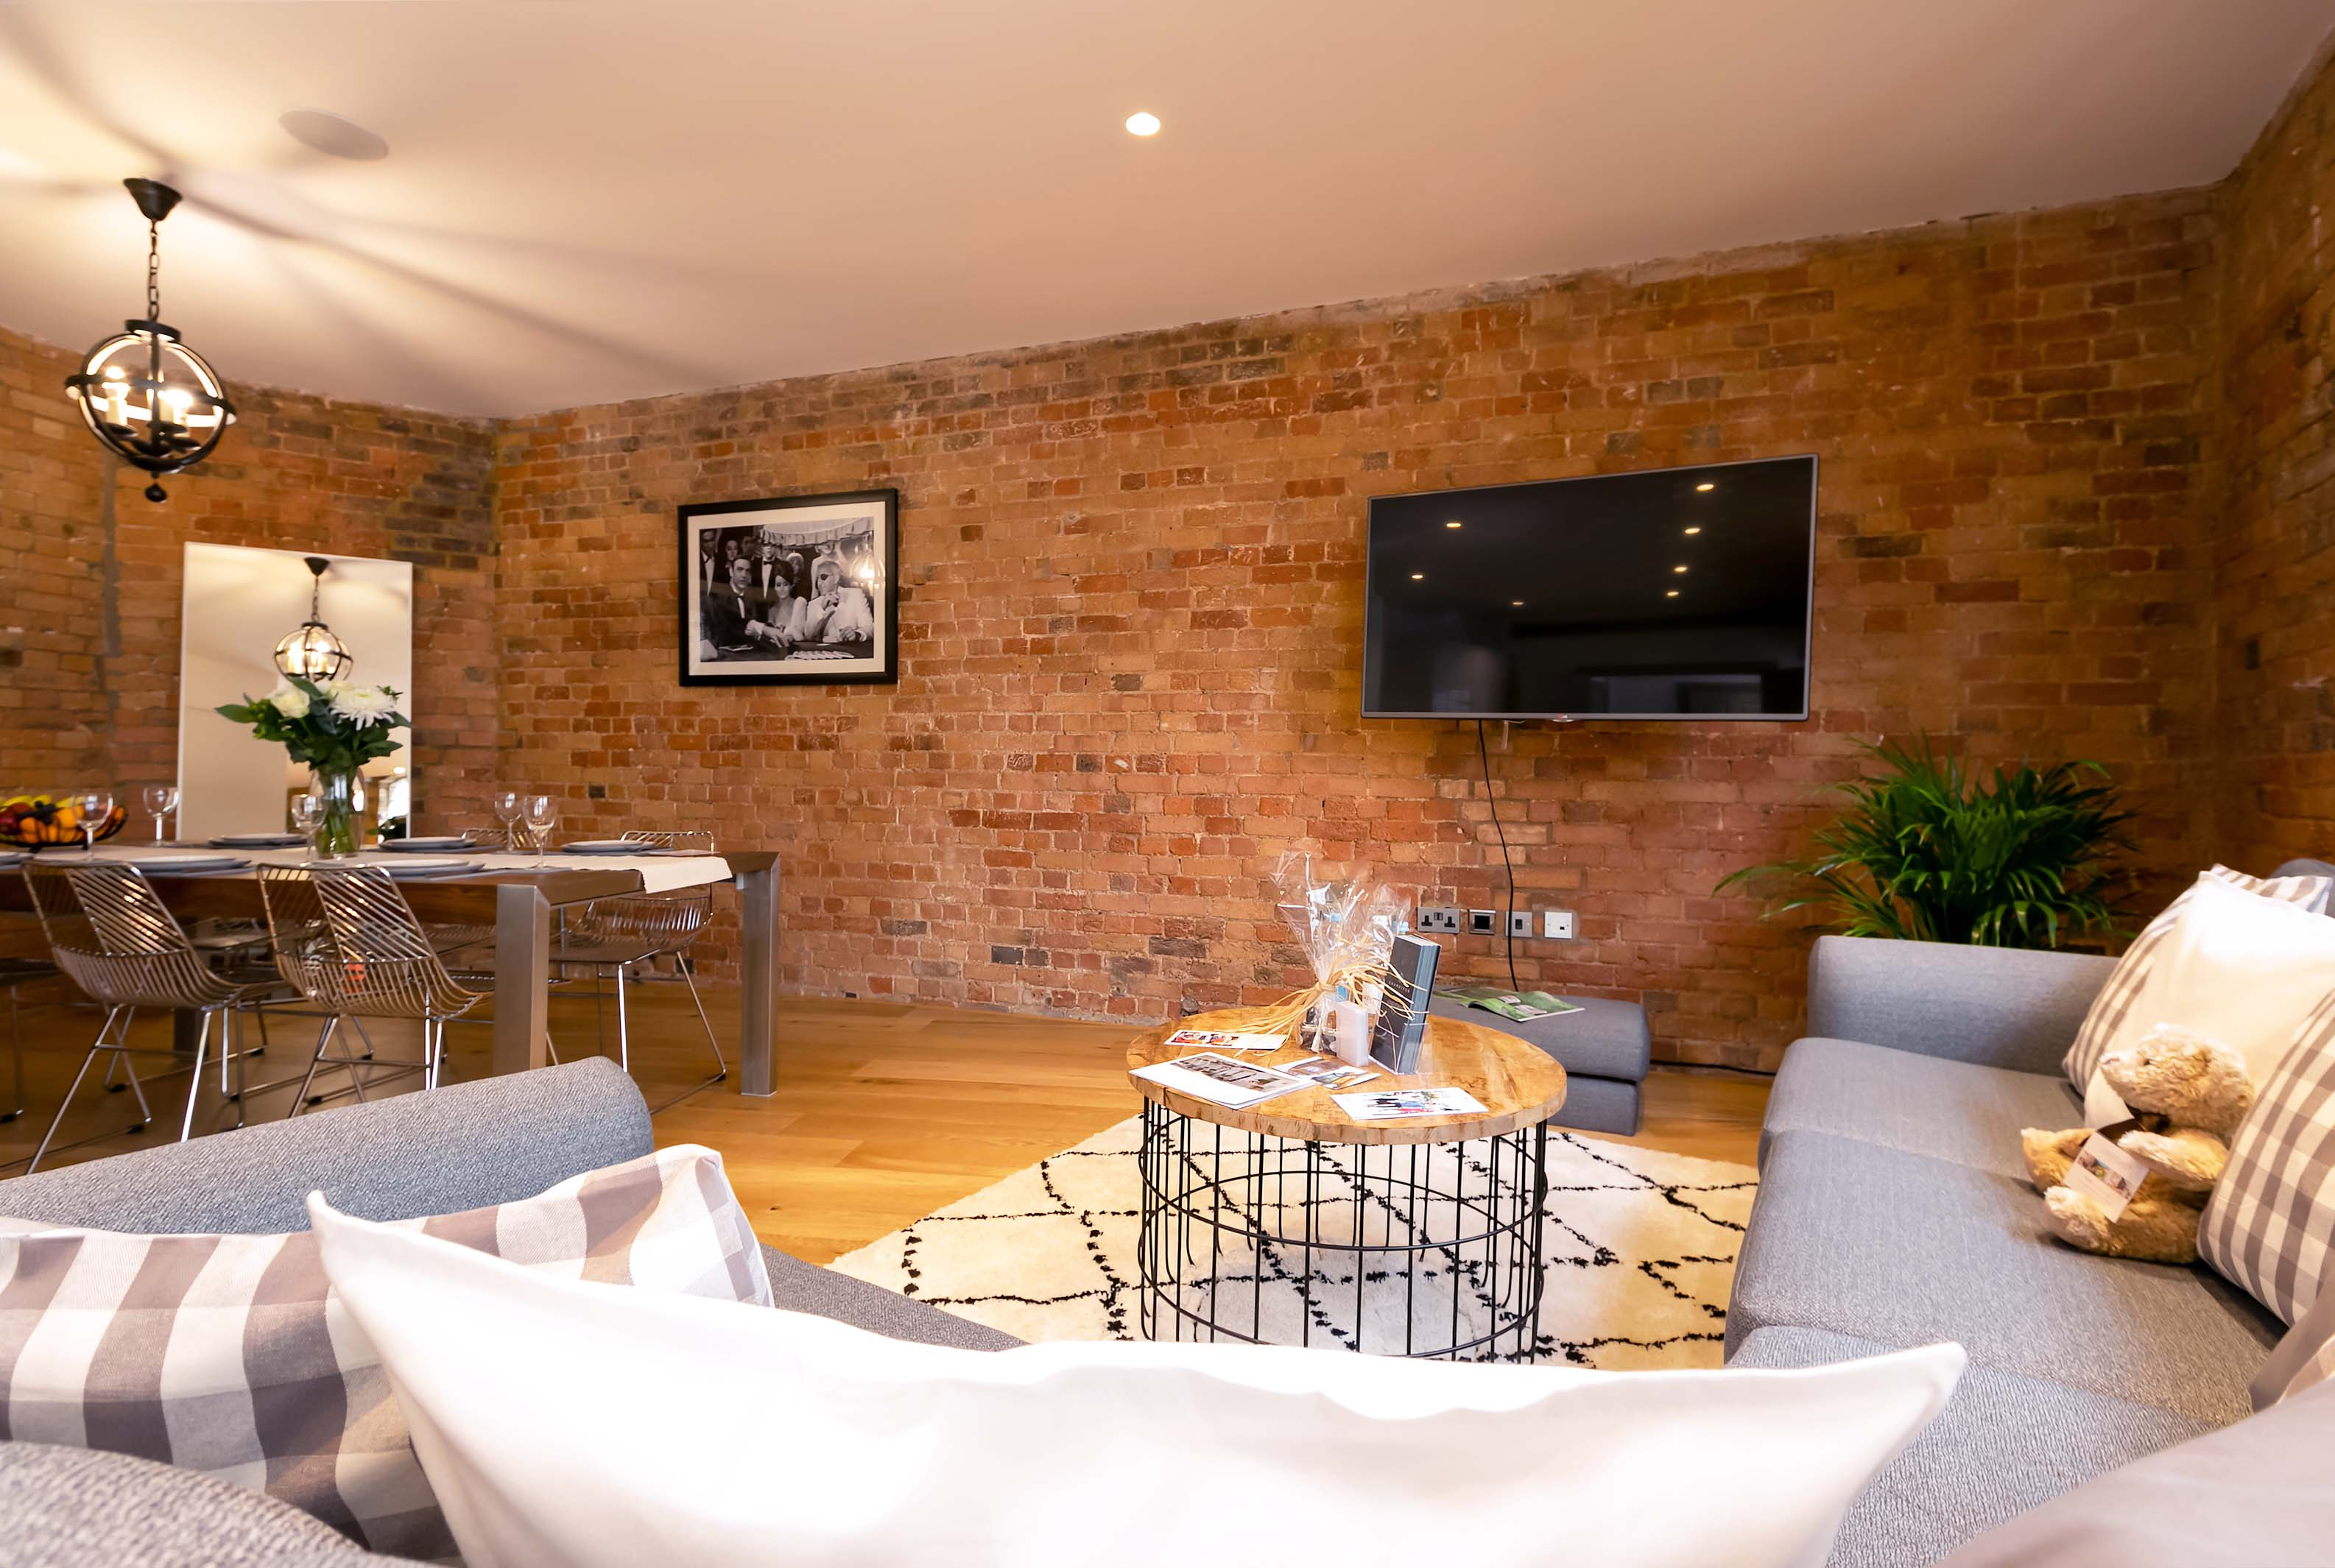 Lovelydays luxury service apartment rental - London - Fitzrovia - Wells Mews B - Lovelysuite - 2 bedrooms - 2 bathrooms - Luxury living room - 34e316ff014e - Lovelydays